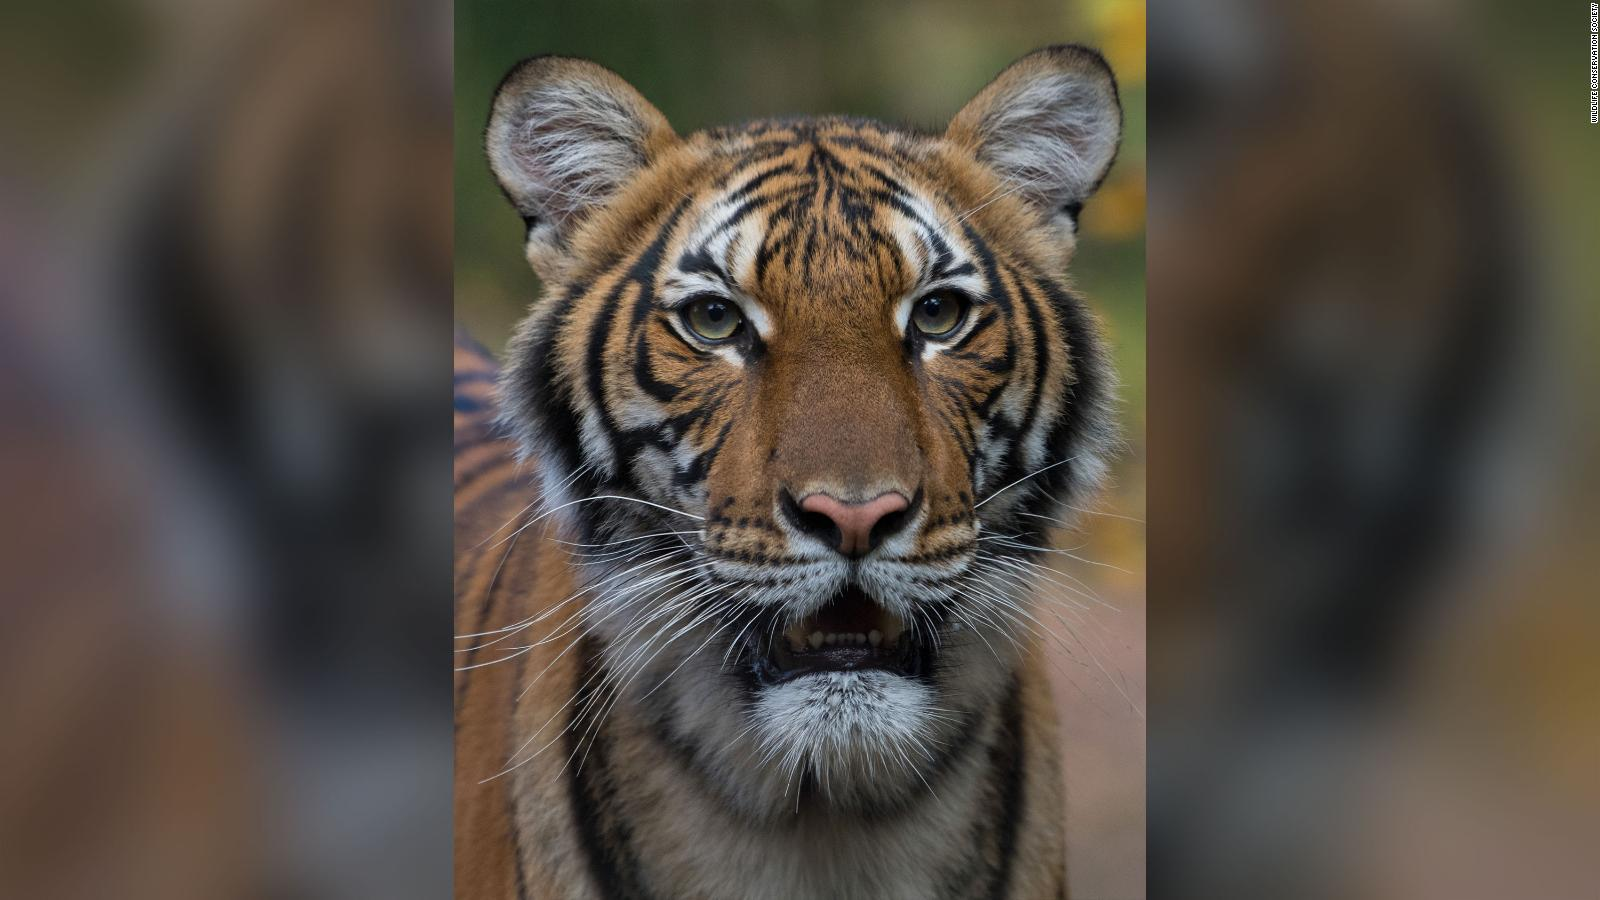 Tiger Tests Positive for CoronaVirus in New York